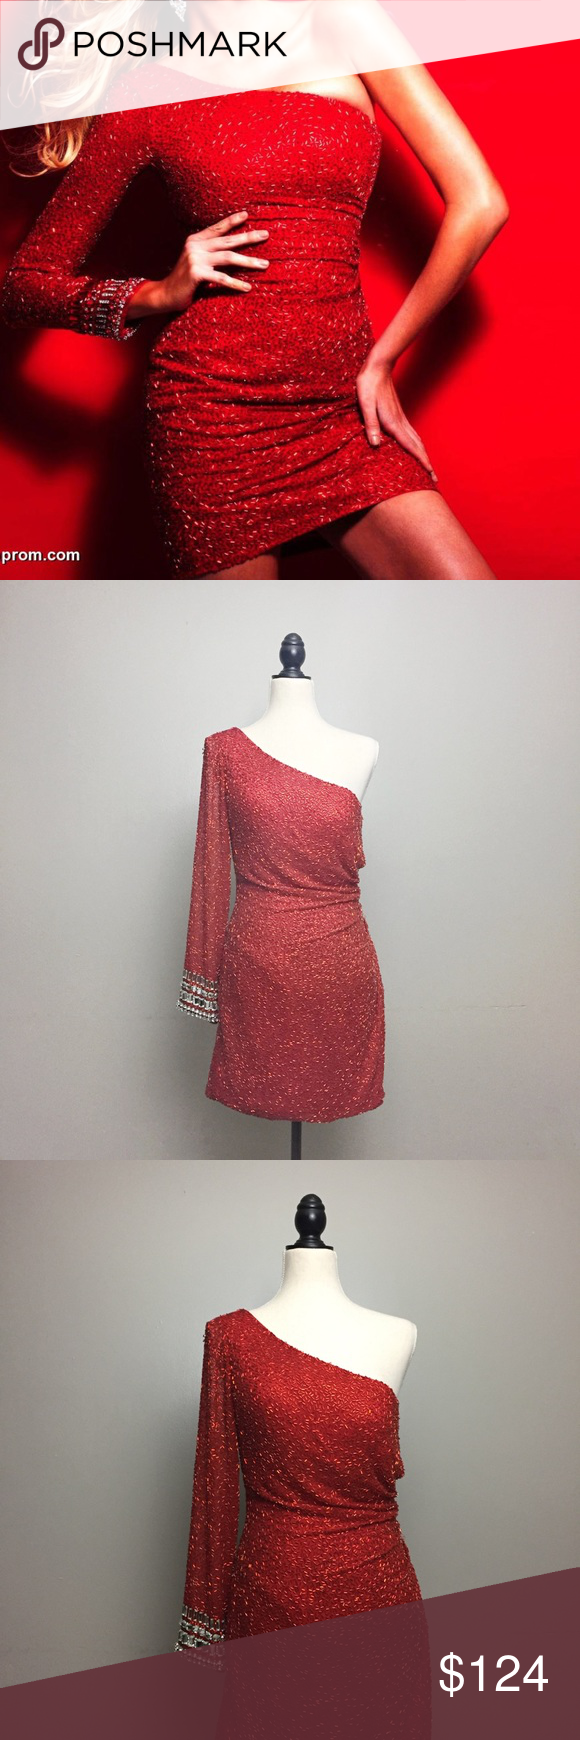 Sherri hill red one shoulder beaded dress sherri hill size